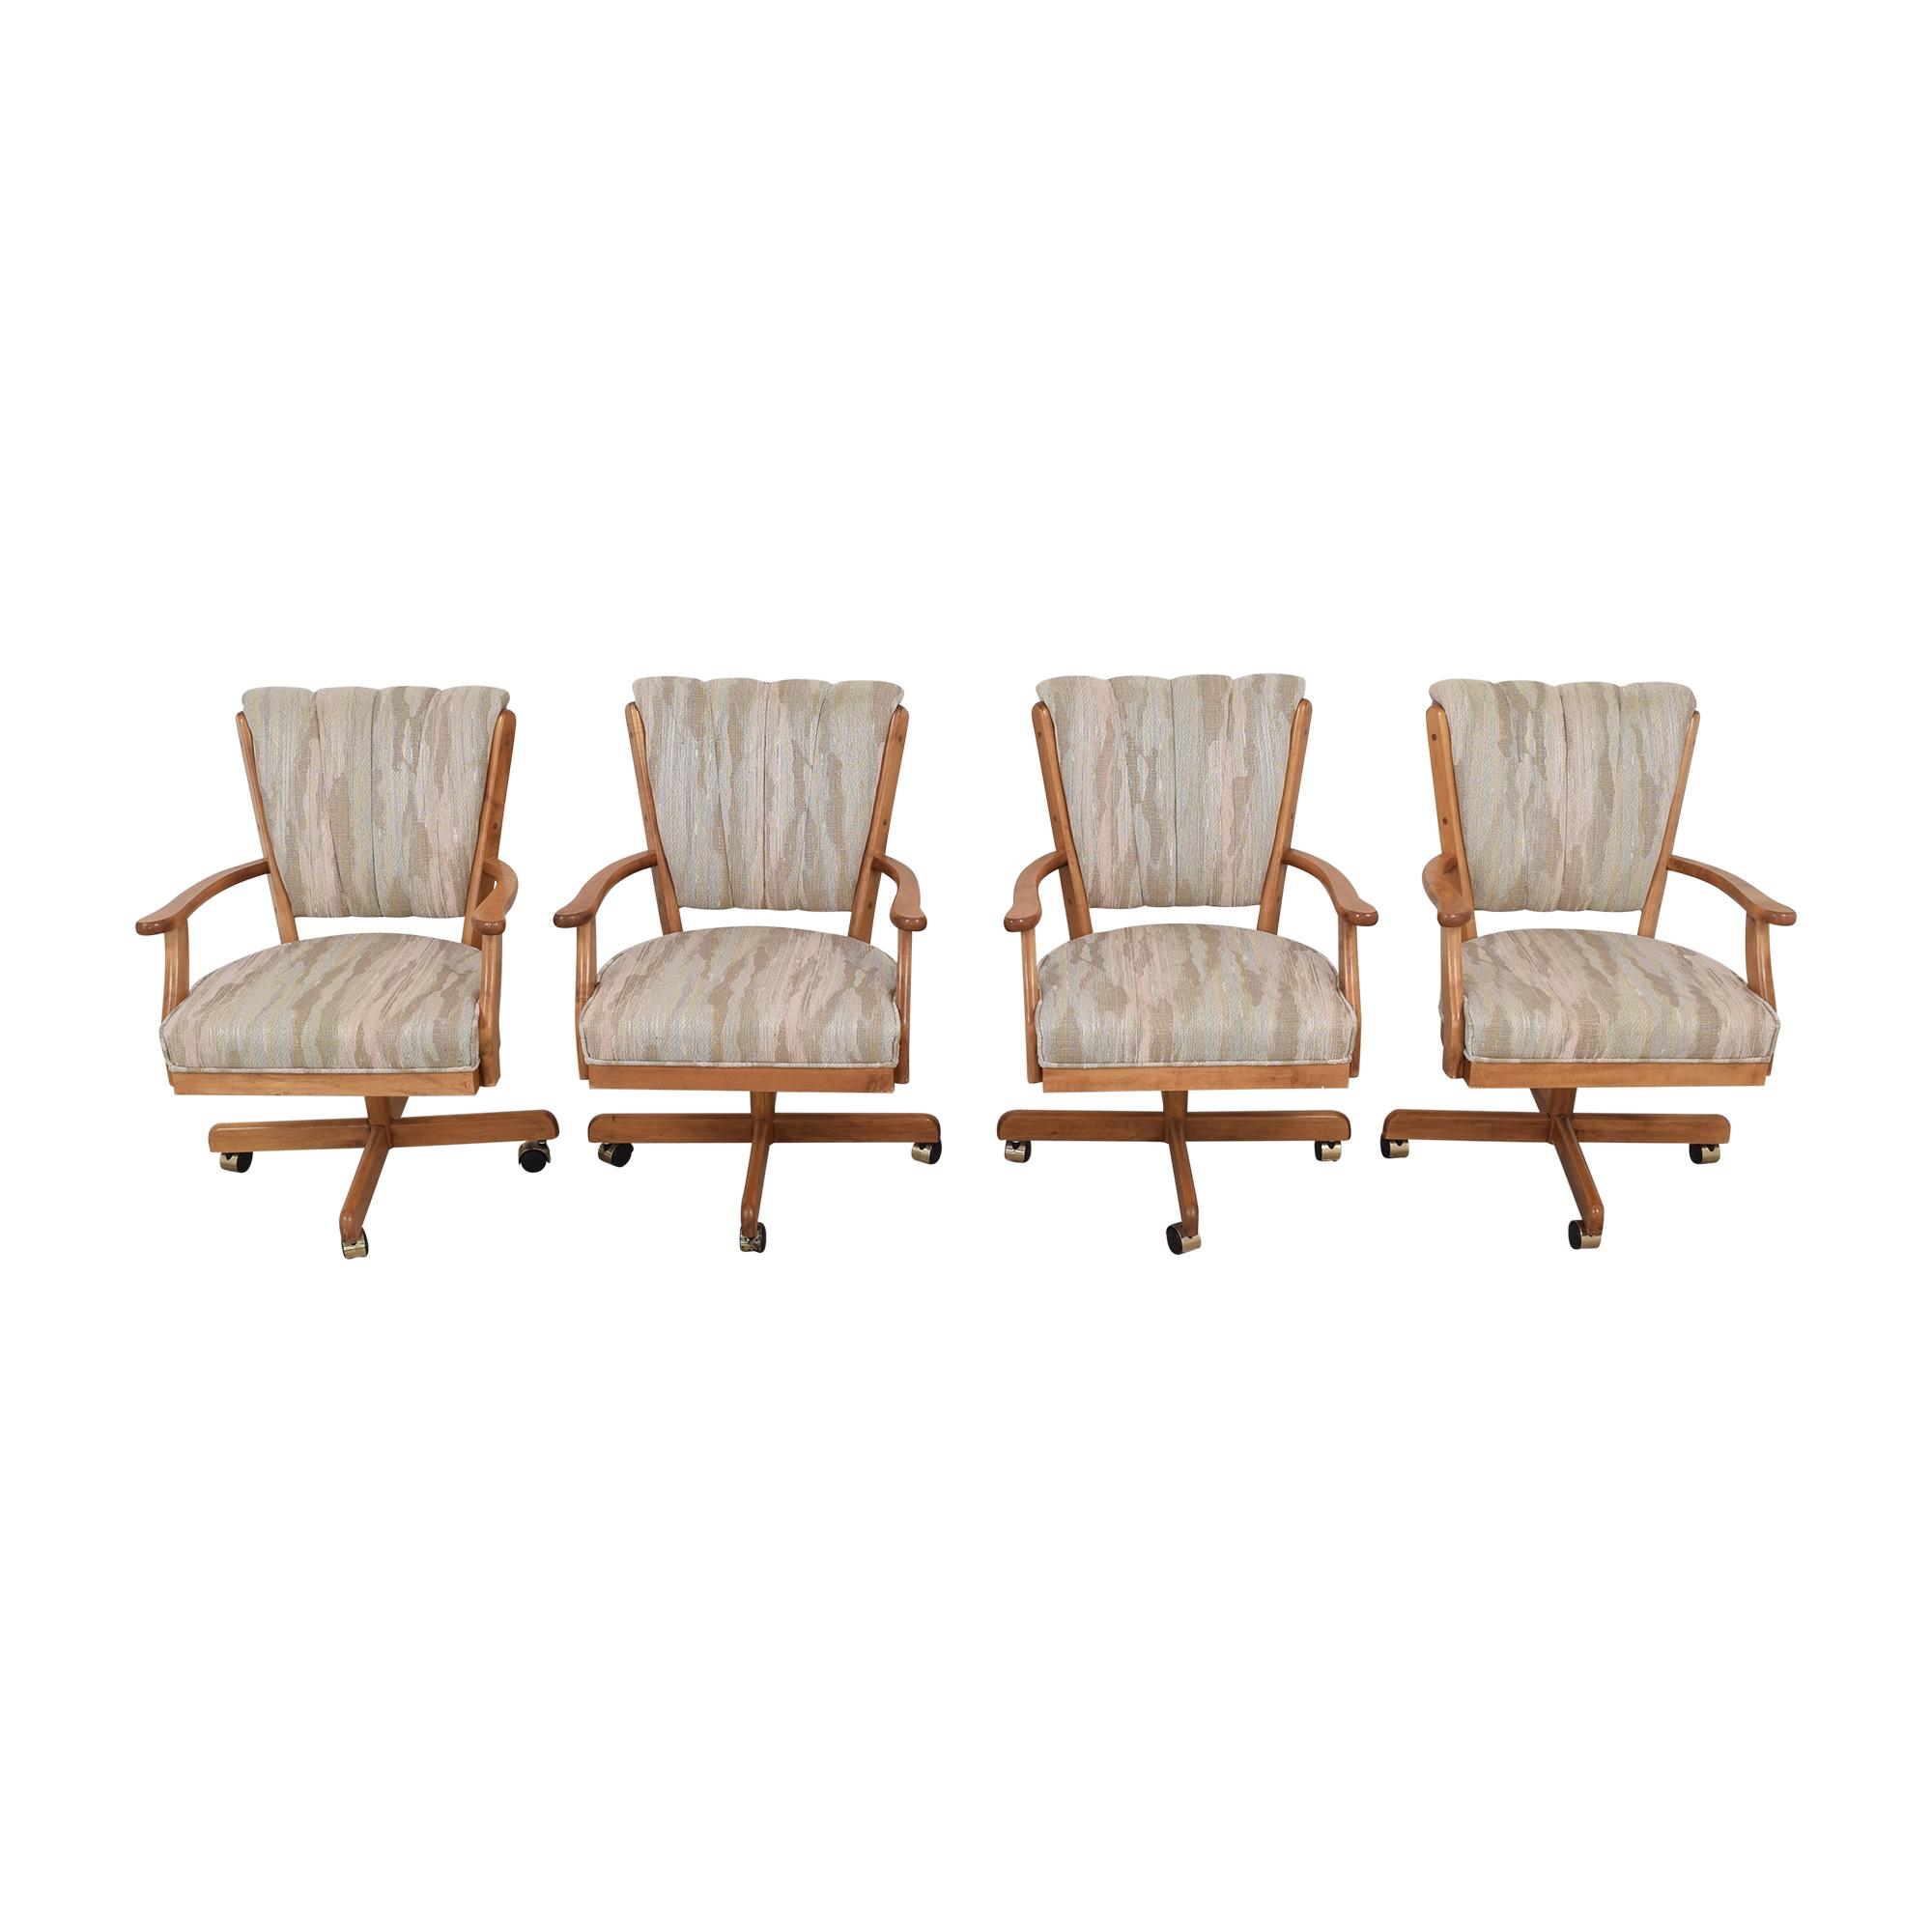 shop JBW Lustig JBW Lustig Dining Chairs online